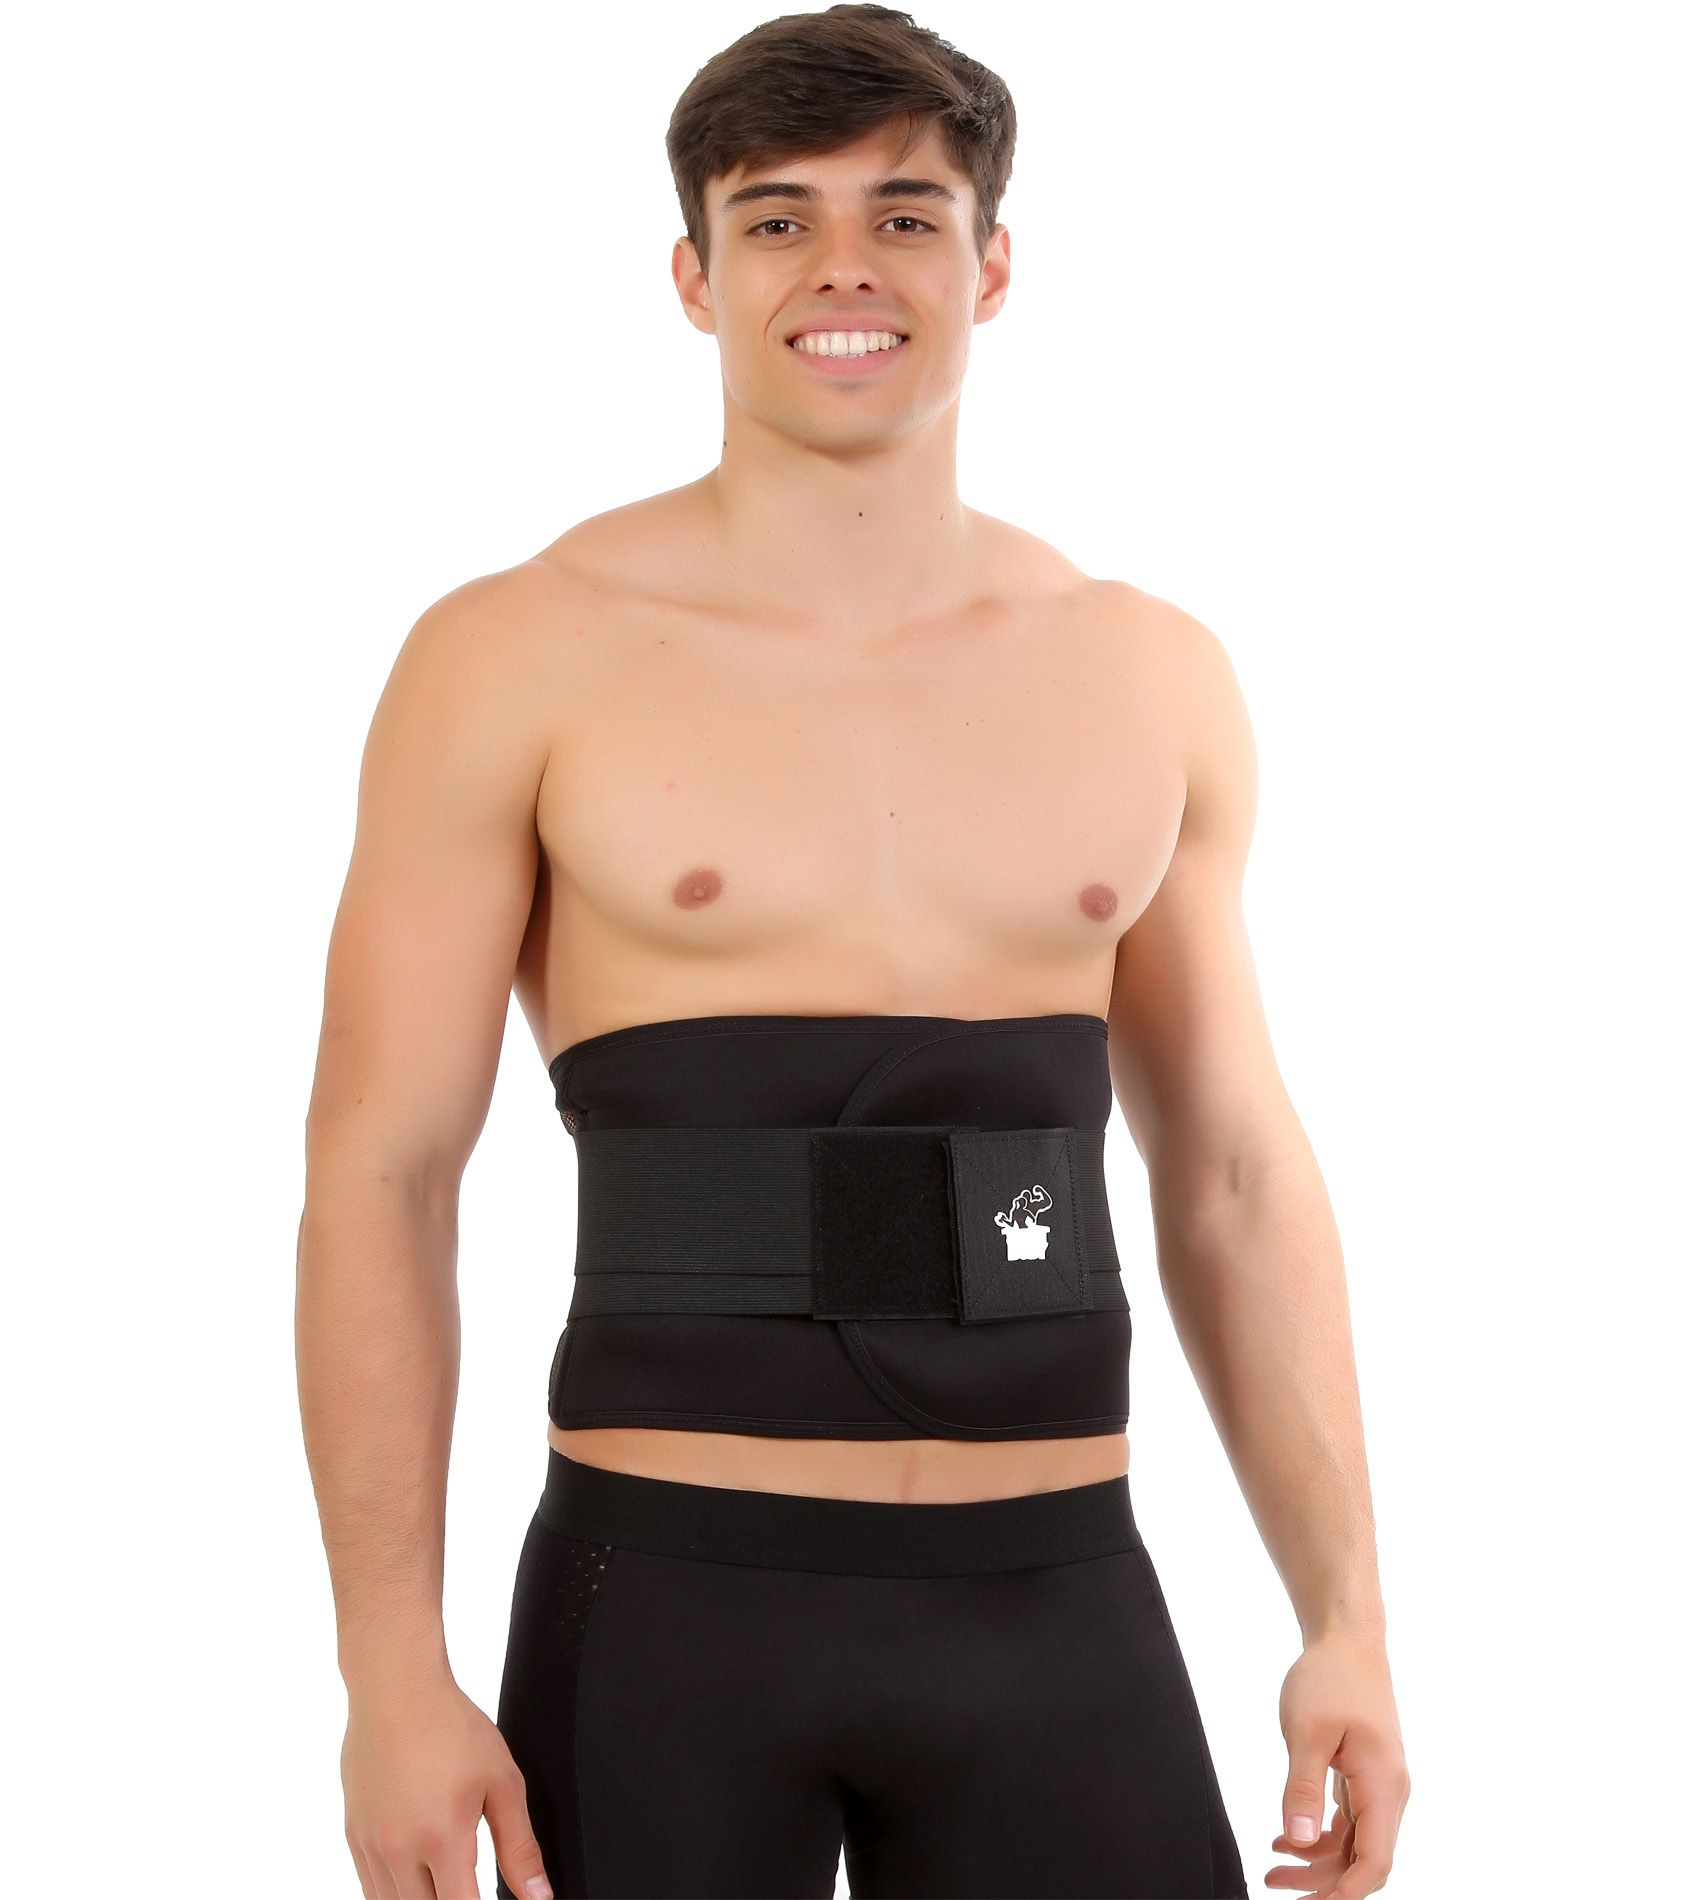 Cinta Modeladora abdominal Neopreme